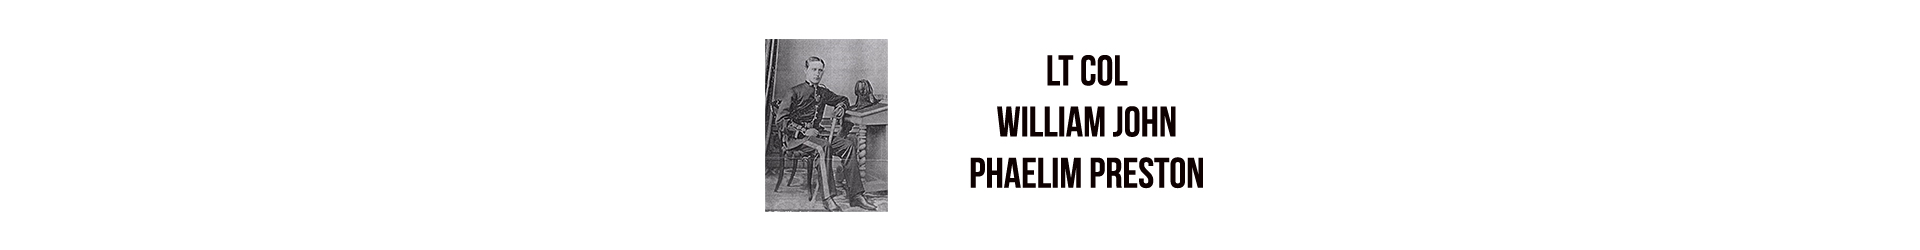 Lt Col William John Phaelim Preston D.S.O., O.B.E.